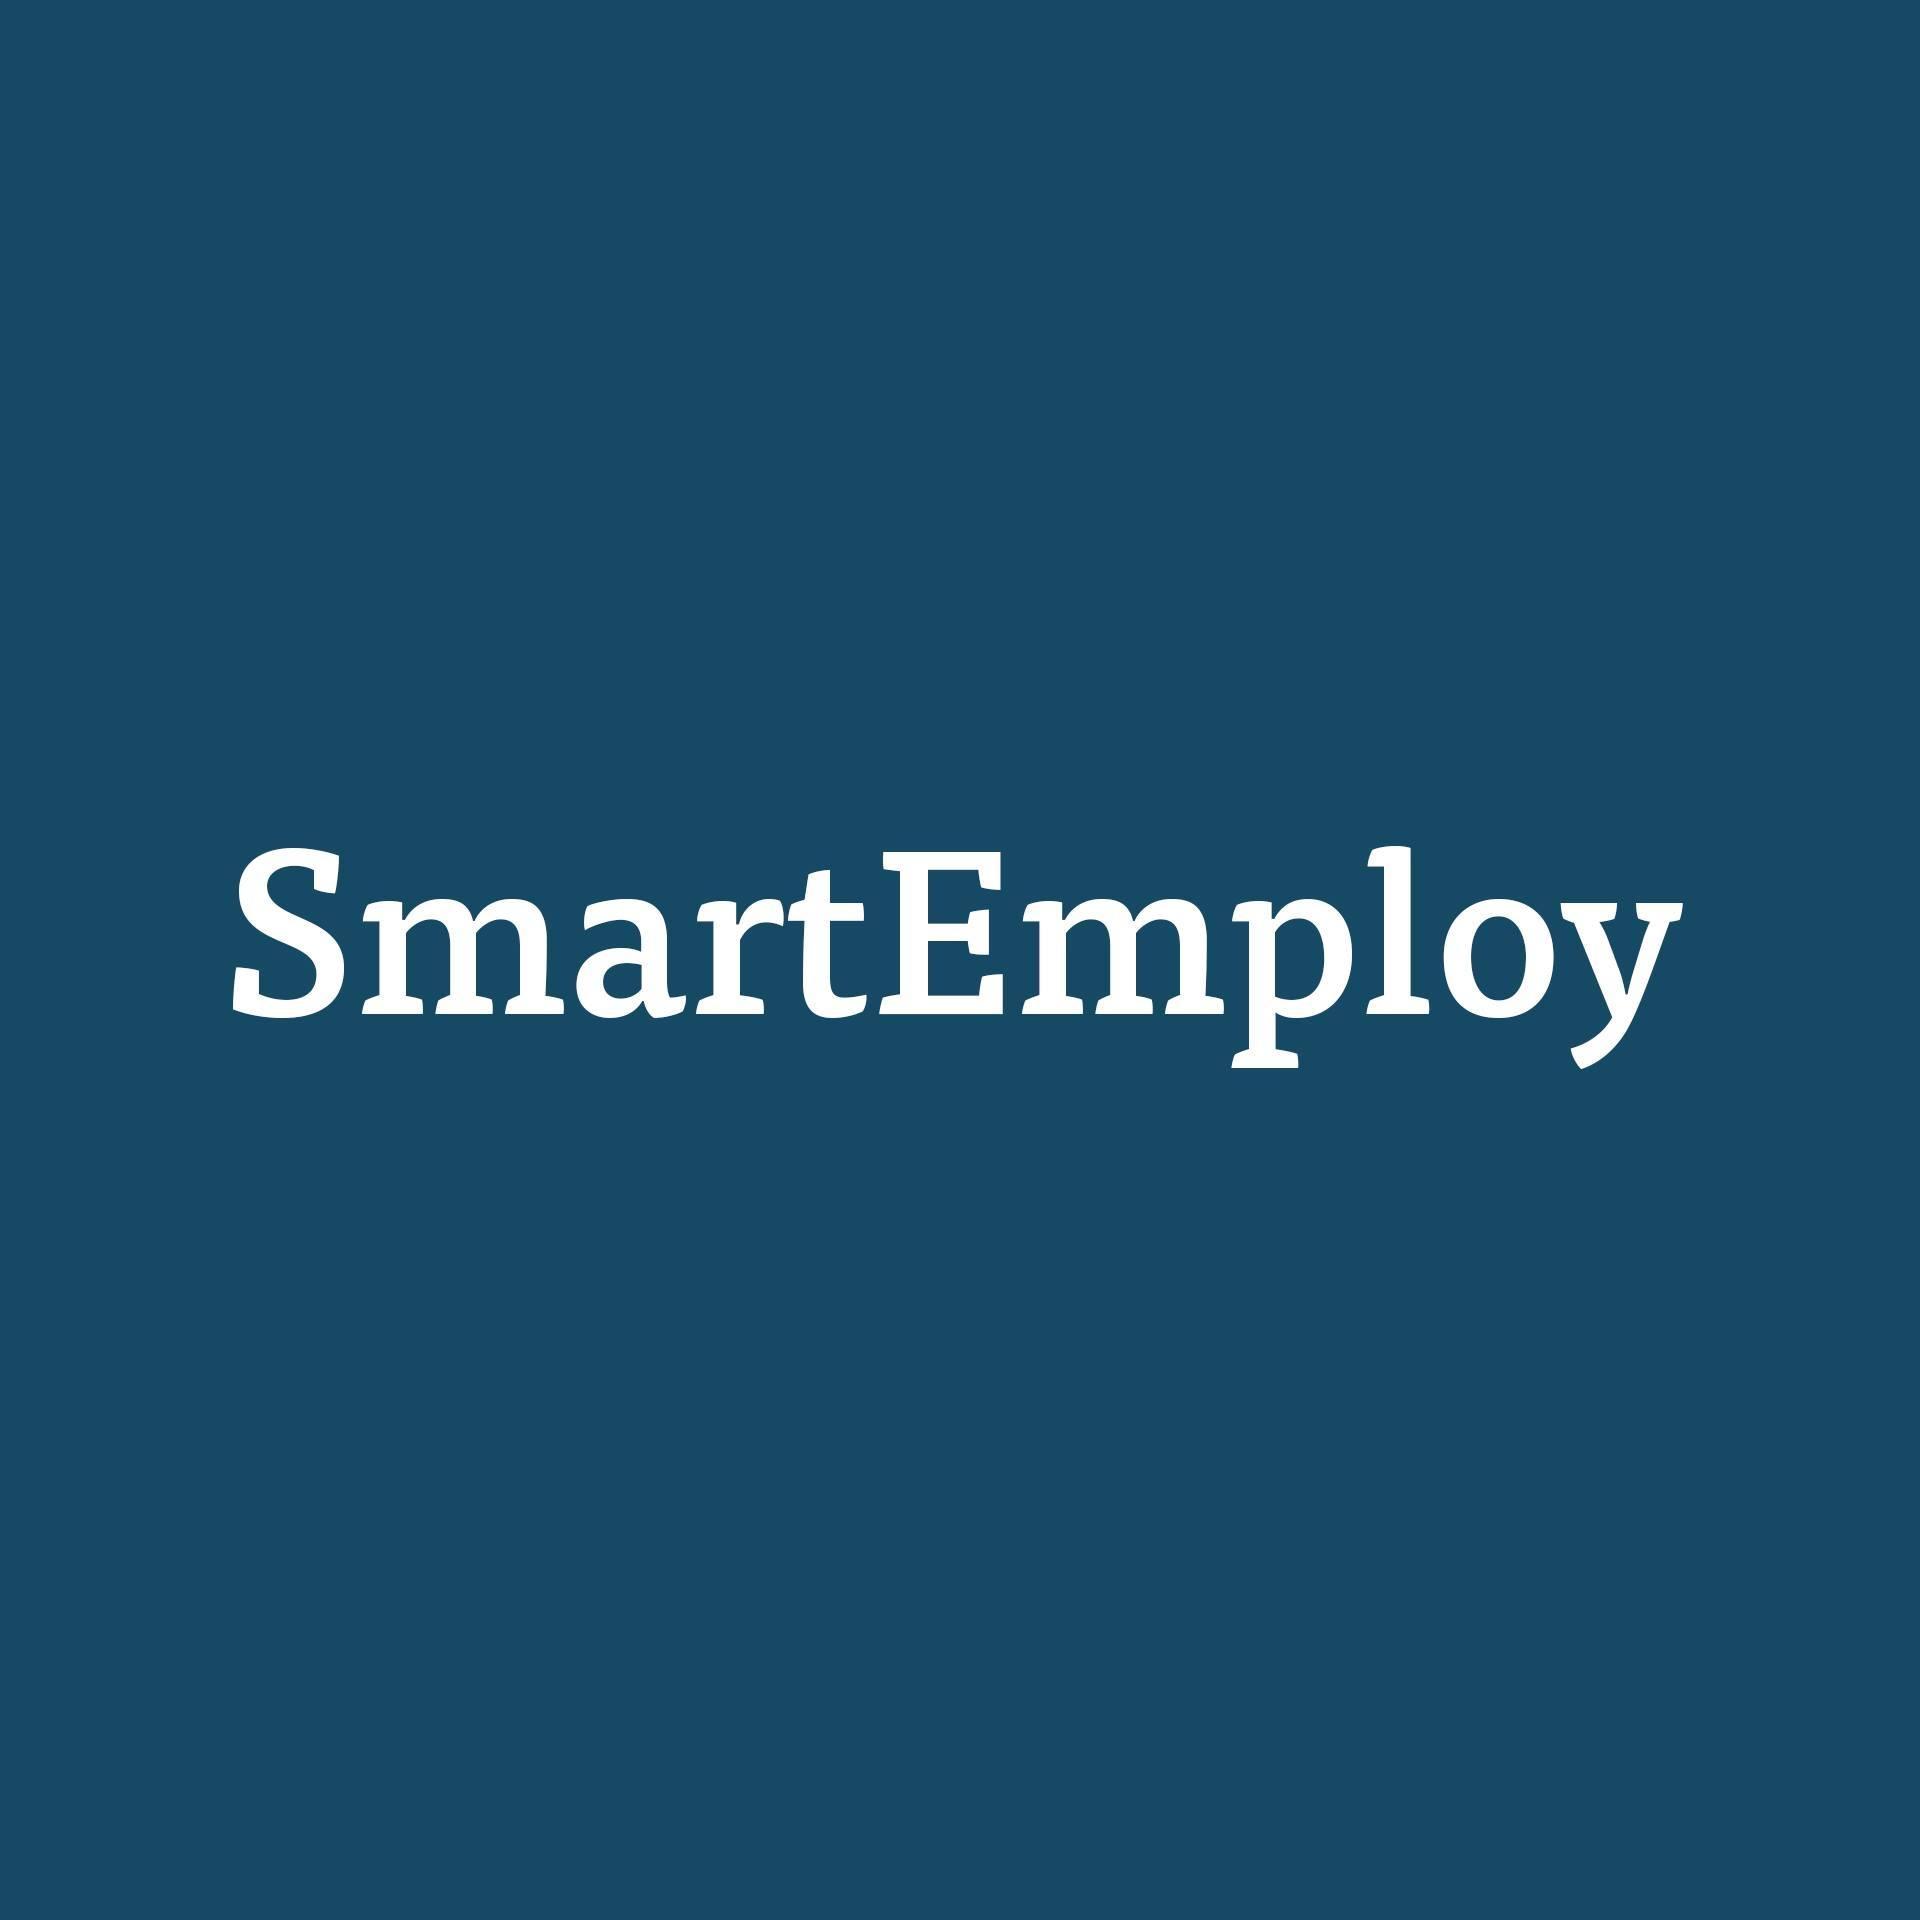 SmartEmploy